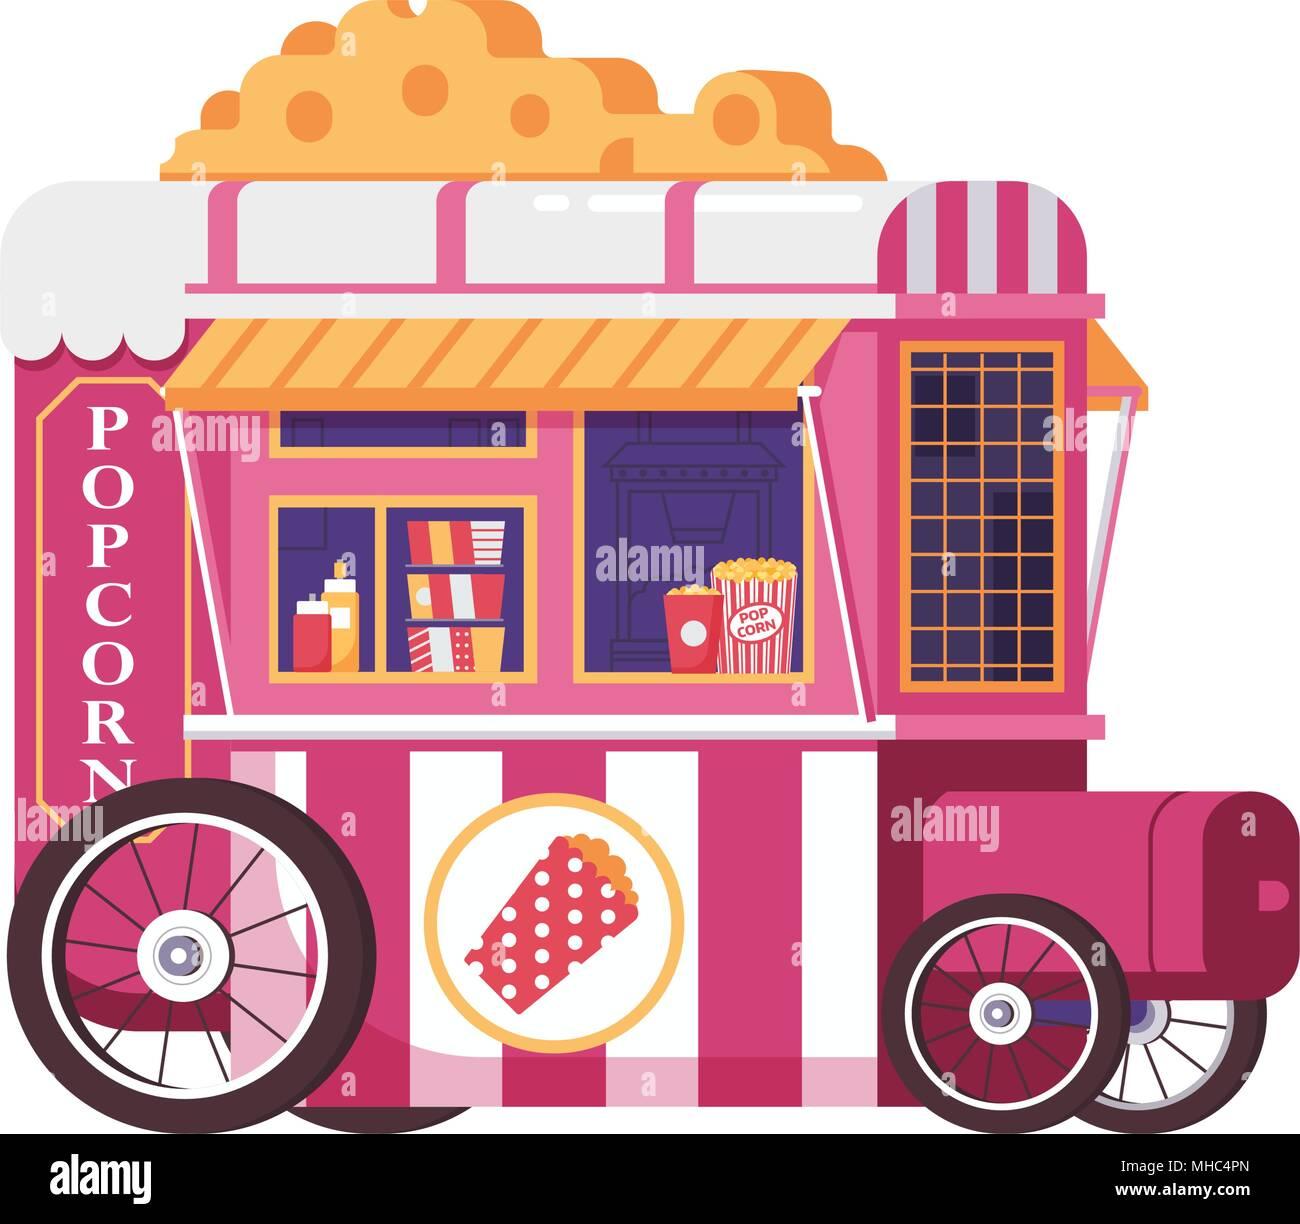 Vending Snack Machine Vector Illustration Imágenes De Stock ...